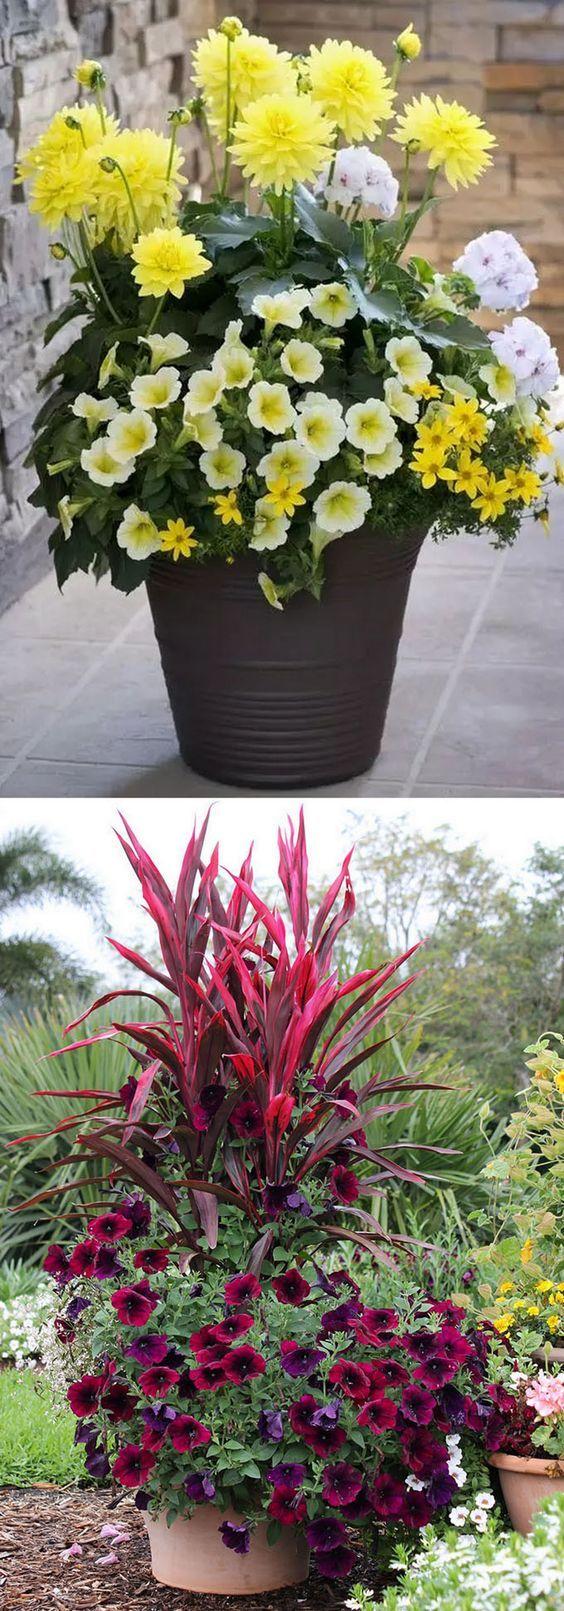 7 best garden wish list perennial hibiscus images on for Perennial container garden designs